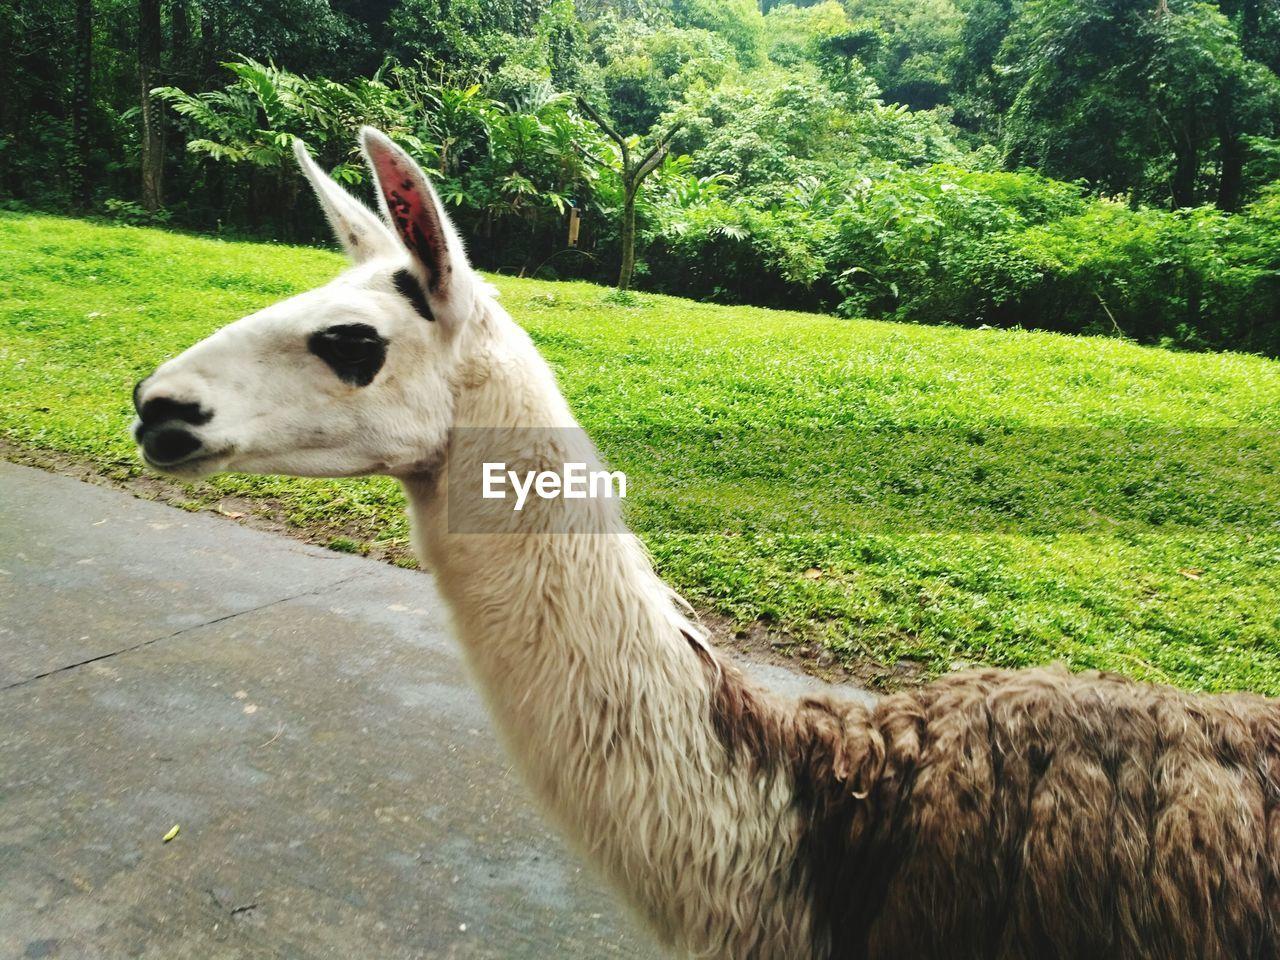 animal themes, one animal, domestic animals, mammal, field, llama, livestock, day, grass, no people, outdoors, green color, alpaca, nature, tree, close-up